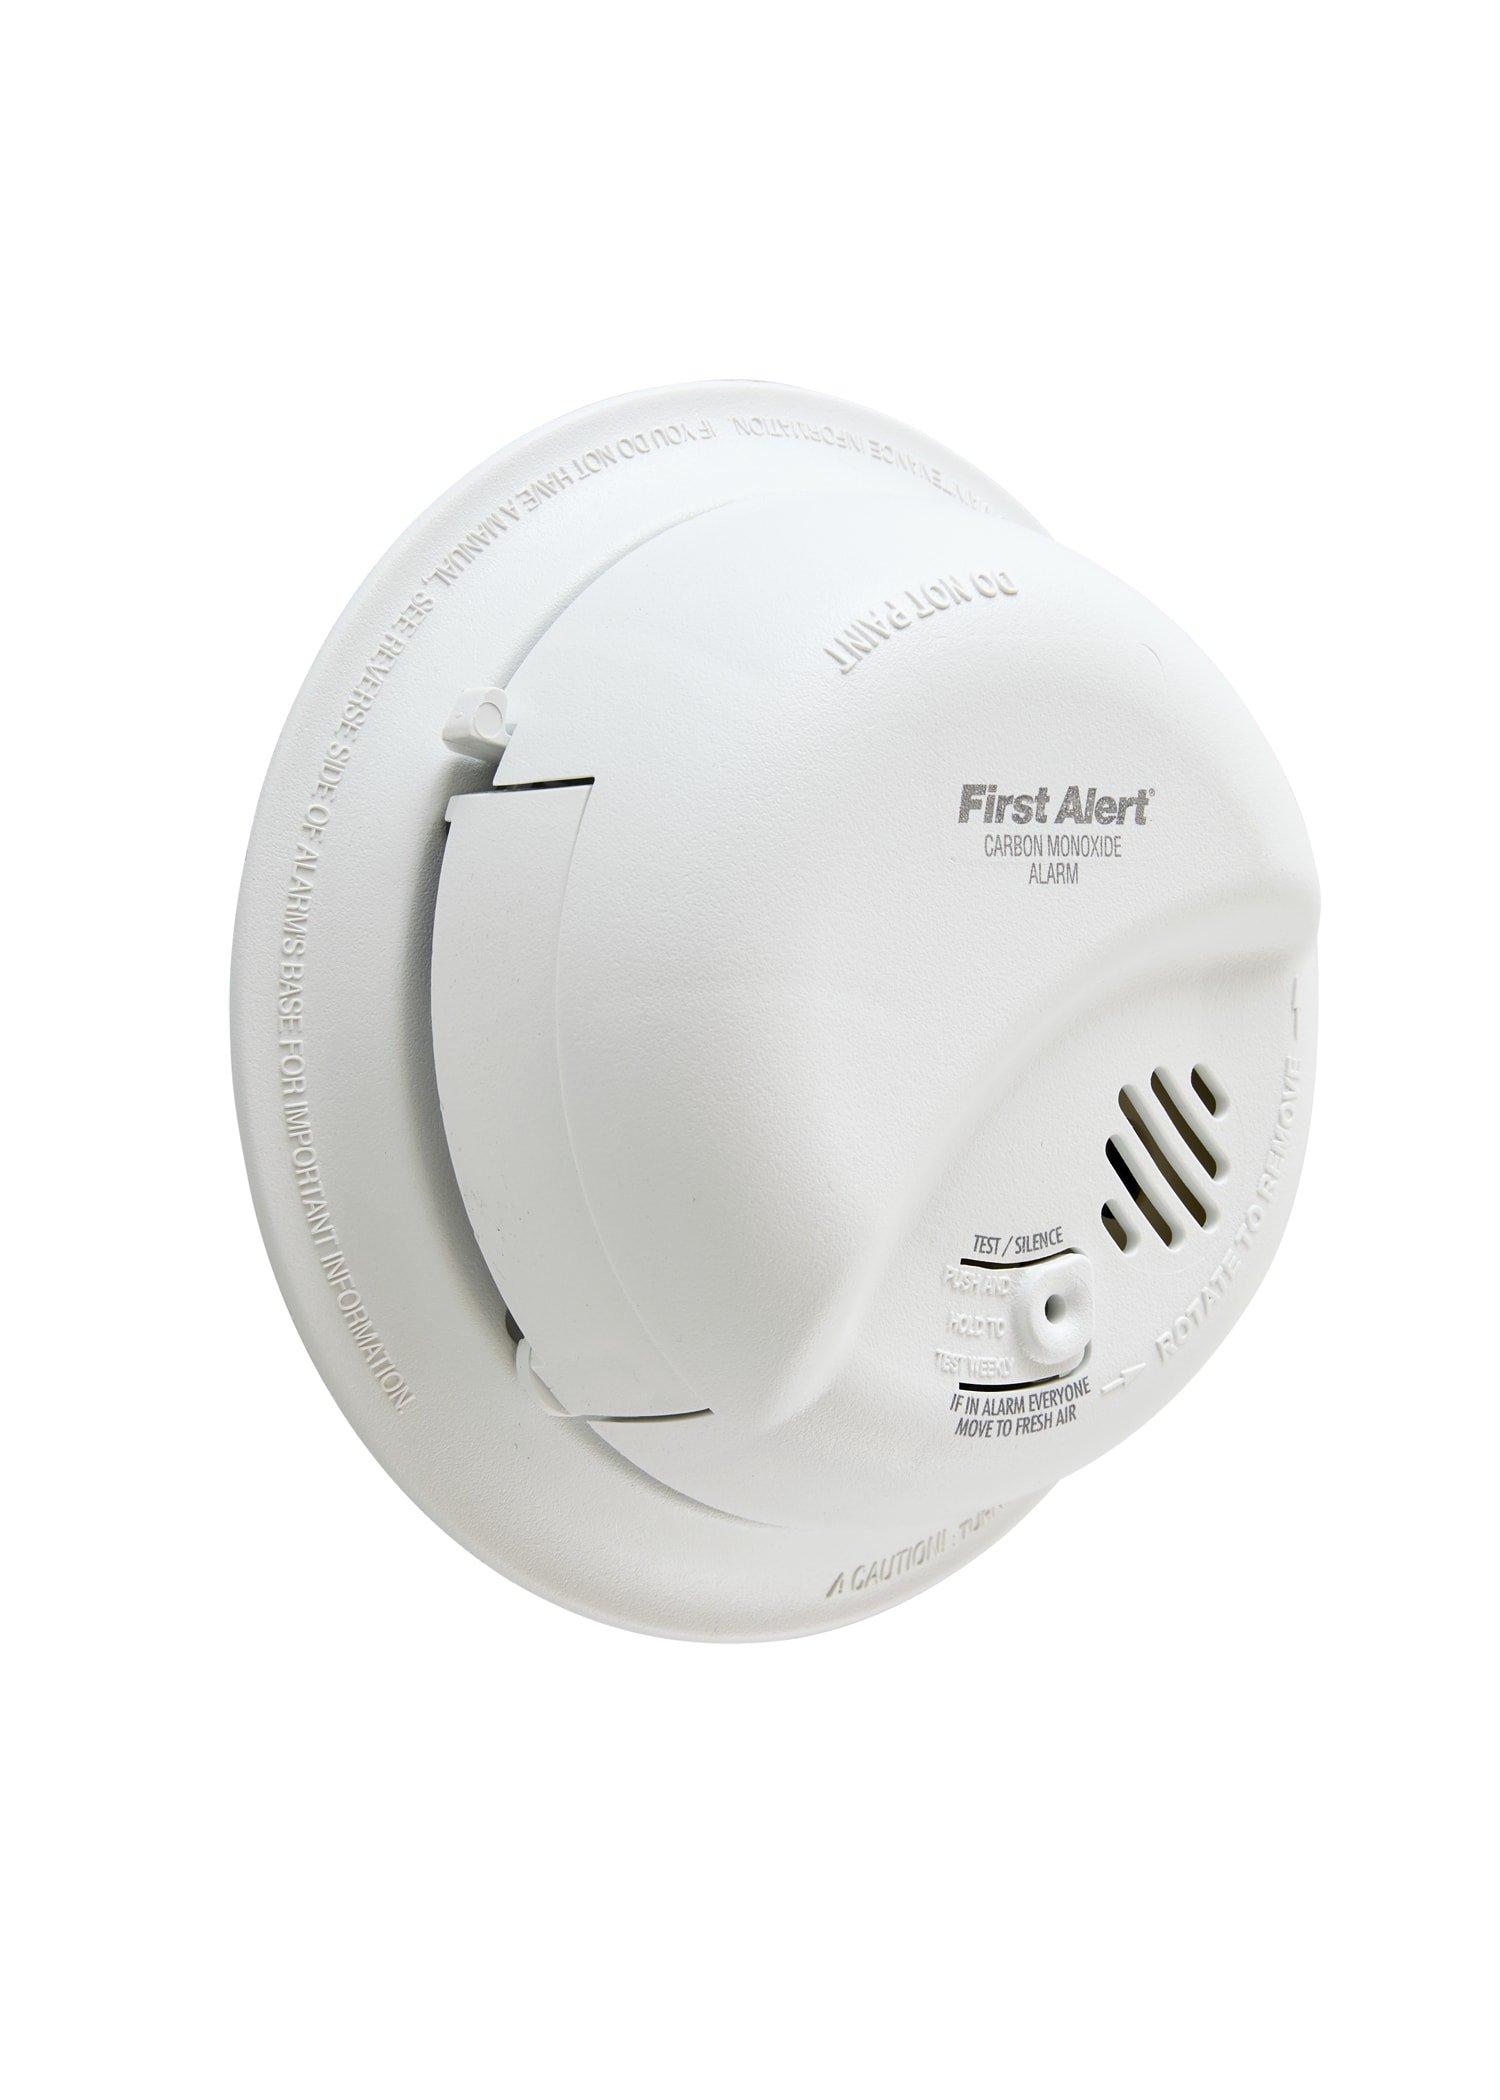 First Alert BRK CO5120BN Hardwire Carbon Monoxide Alarm with Battery Backup